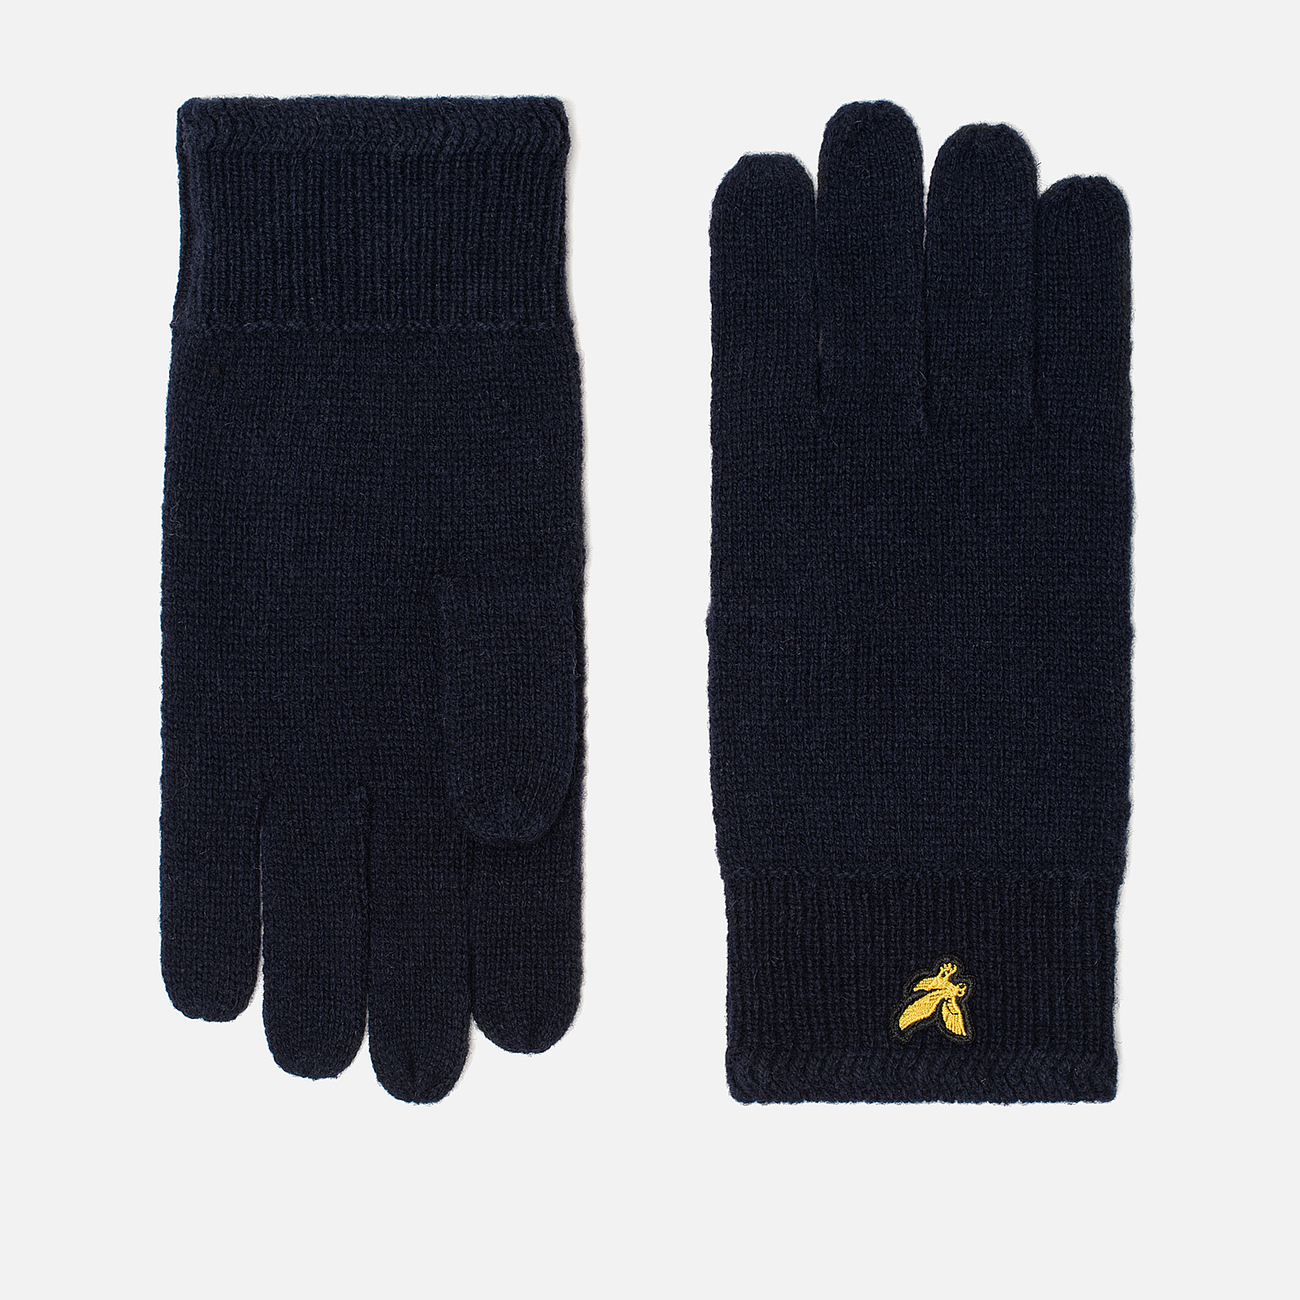 Перчатки Lyle & Scott Racked Rib New Navy